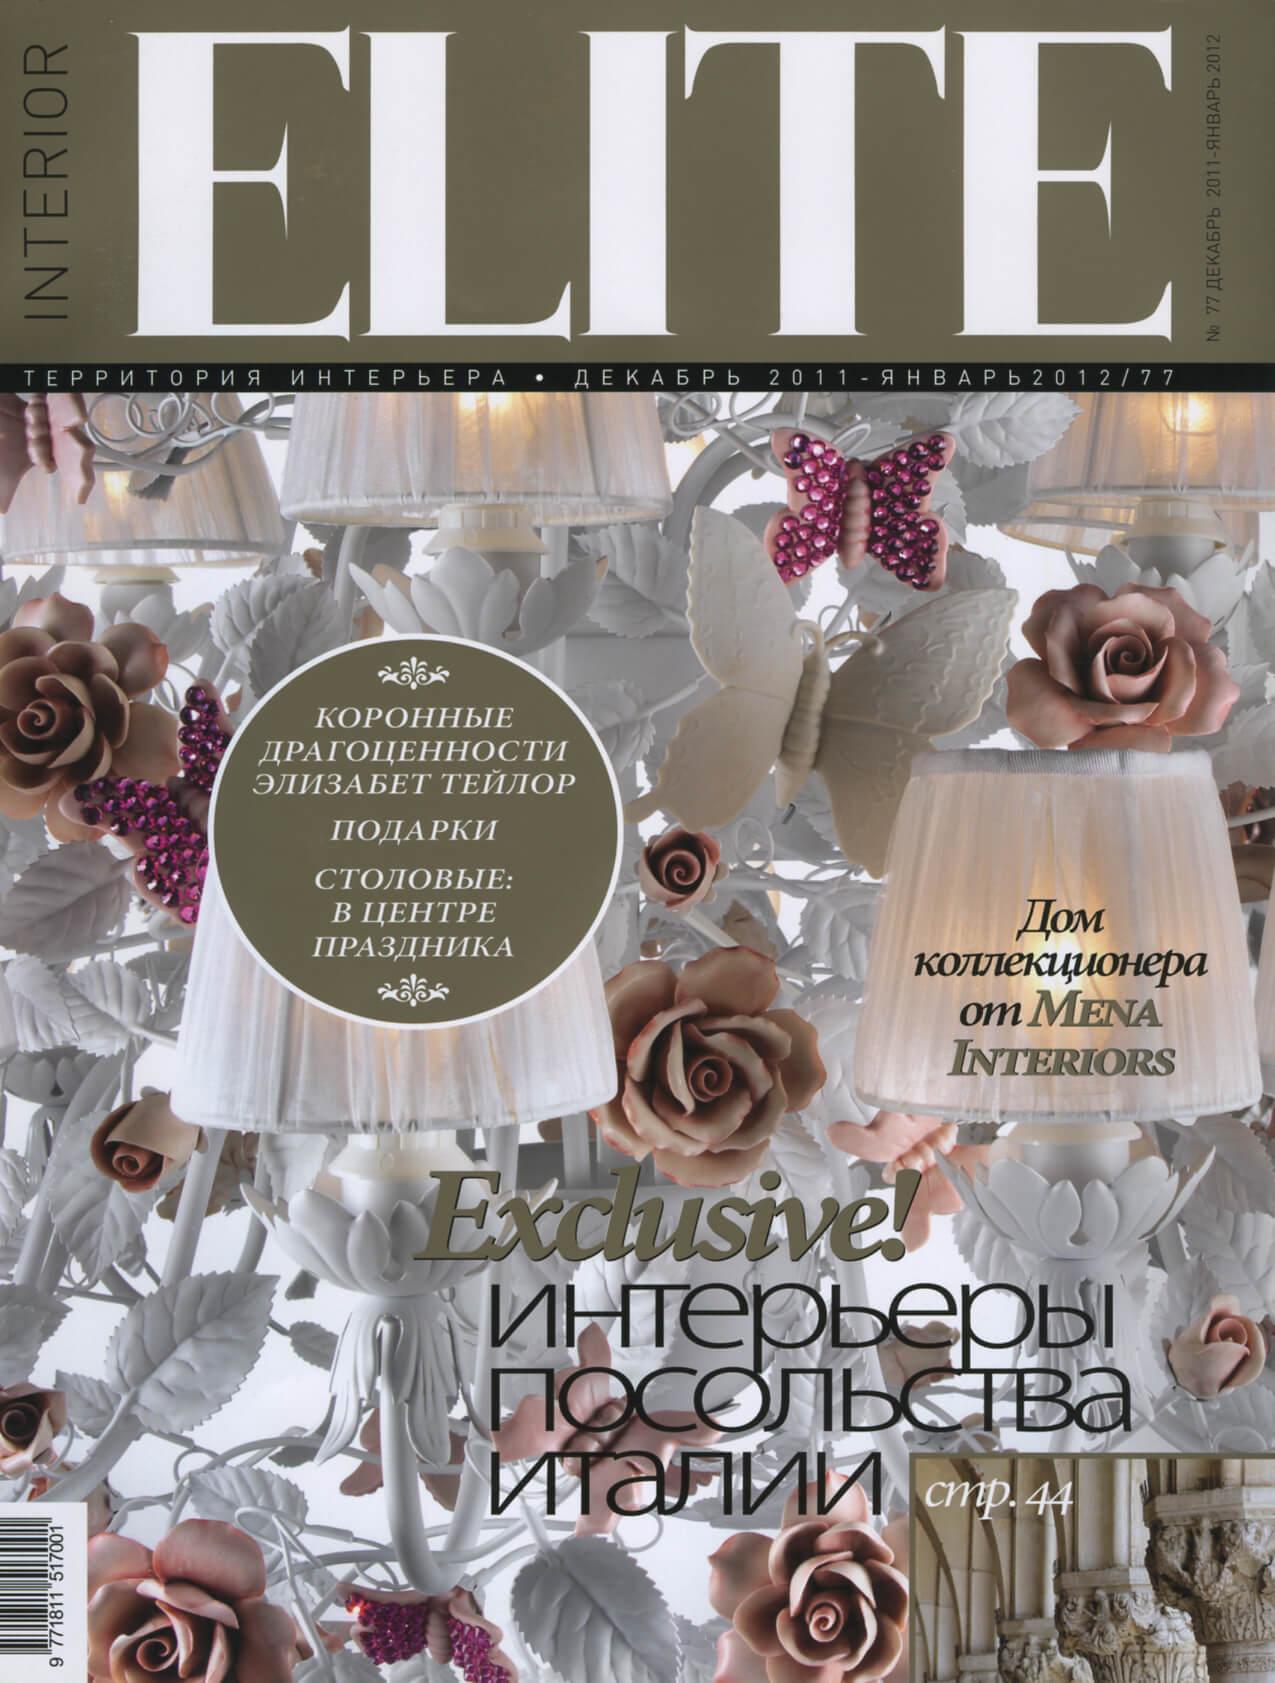 Elite Interior №77 декабрь 2011 - январь 2012